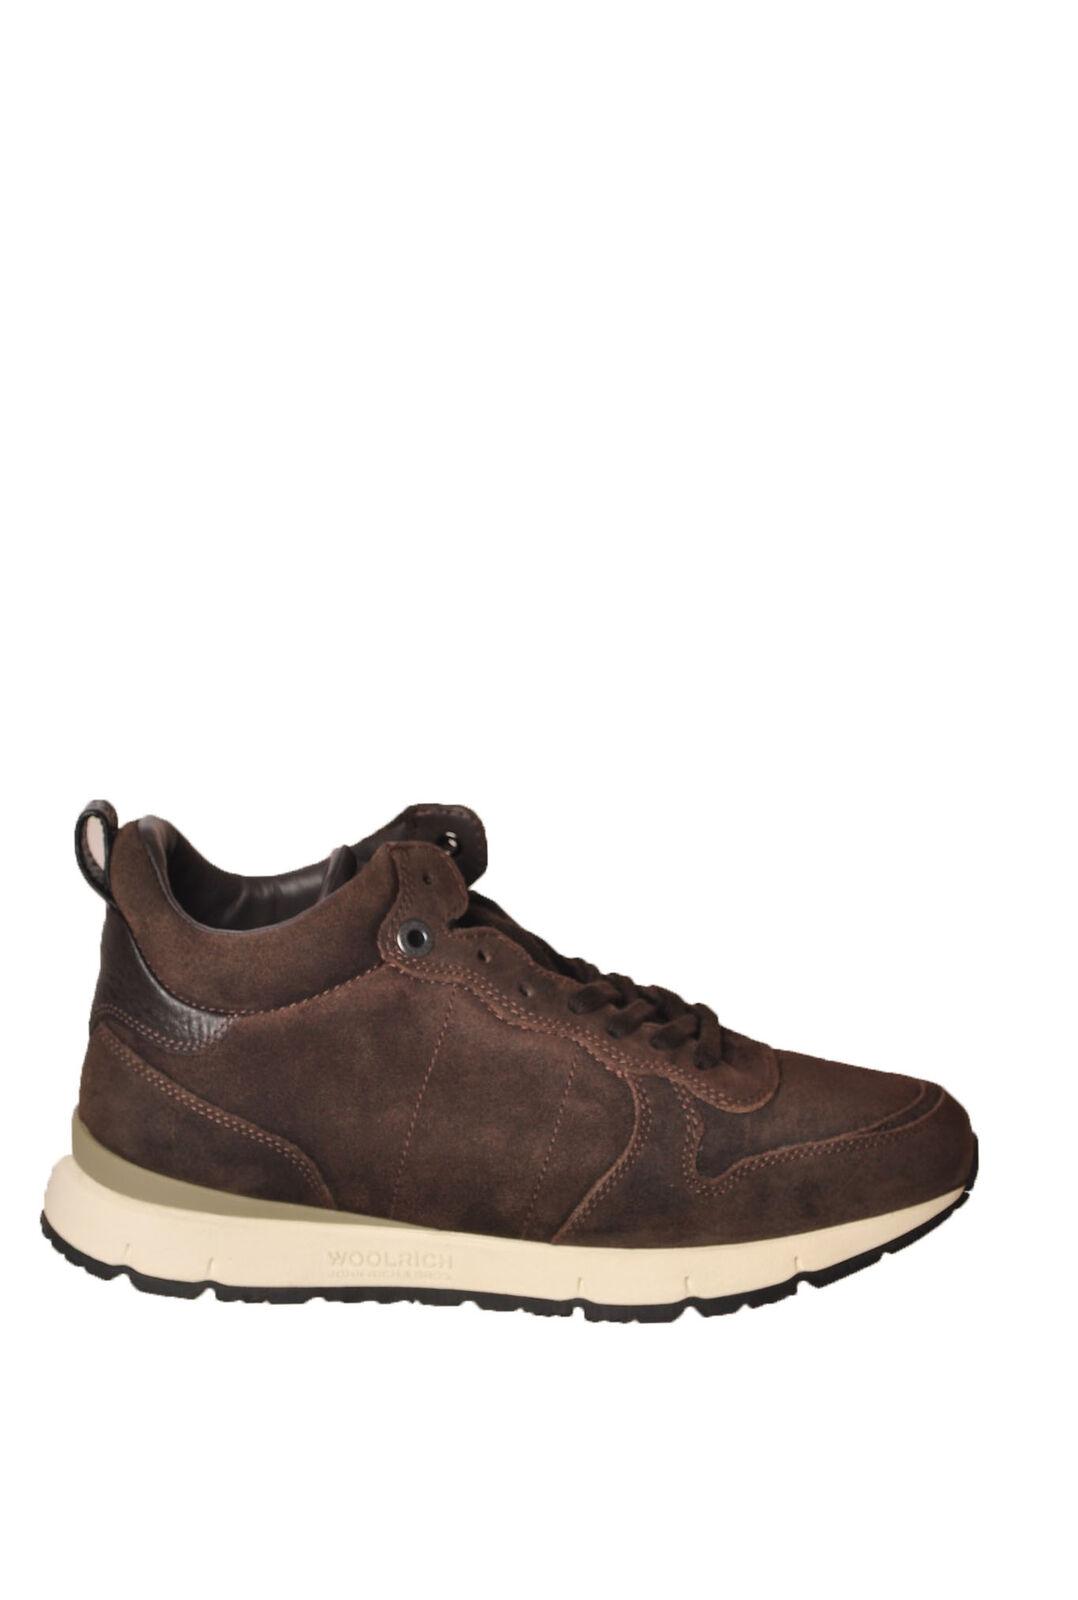 Woolrich - chaussures-chaussures - hommes - marron - 4427513H191951